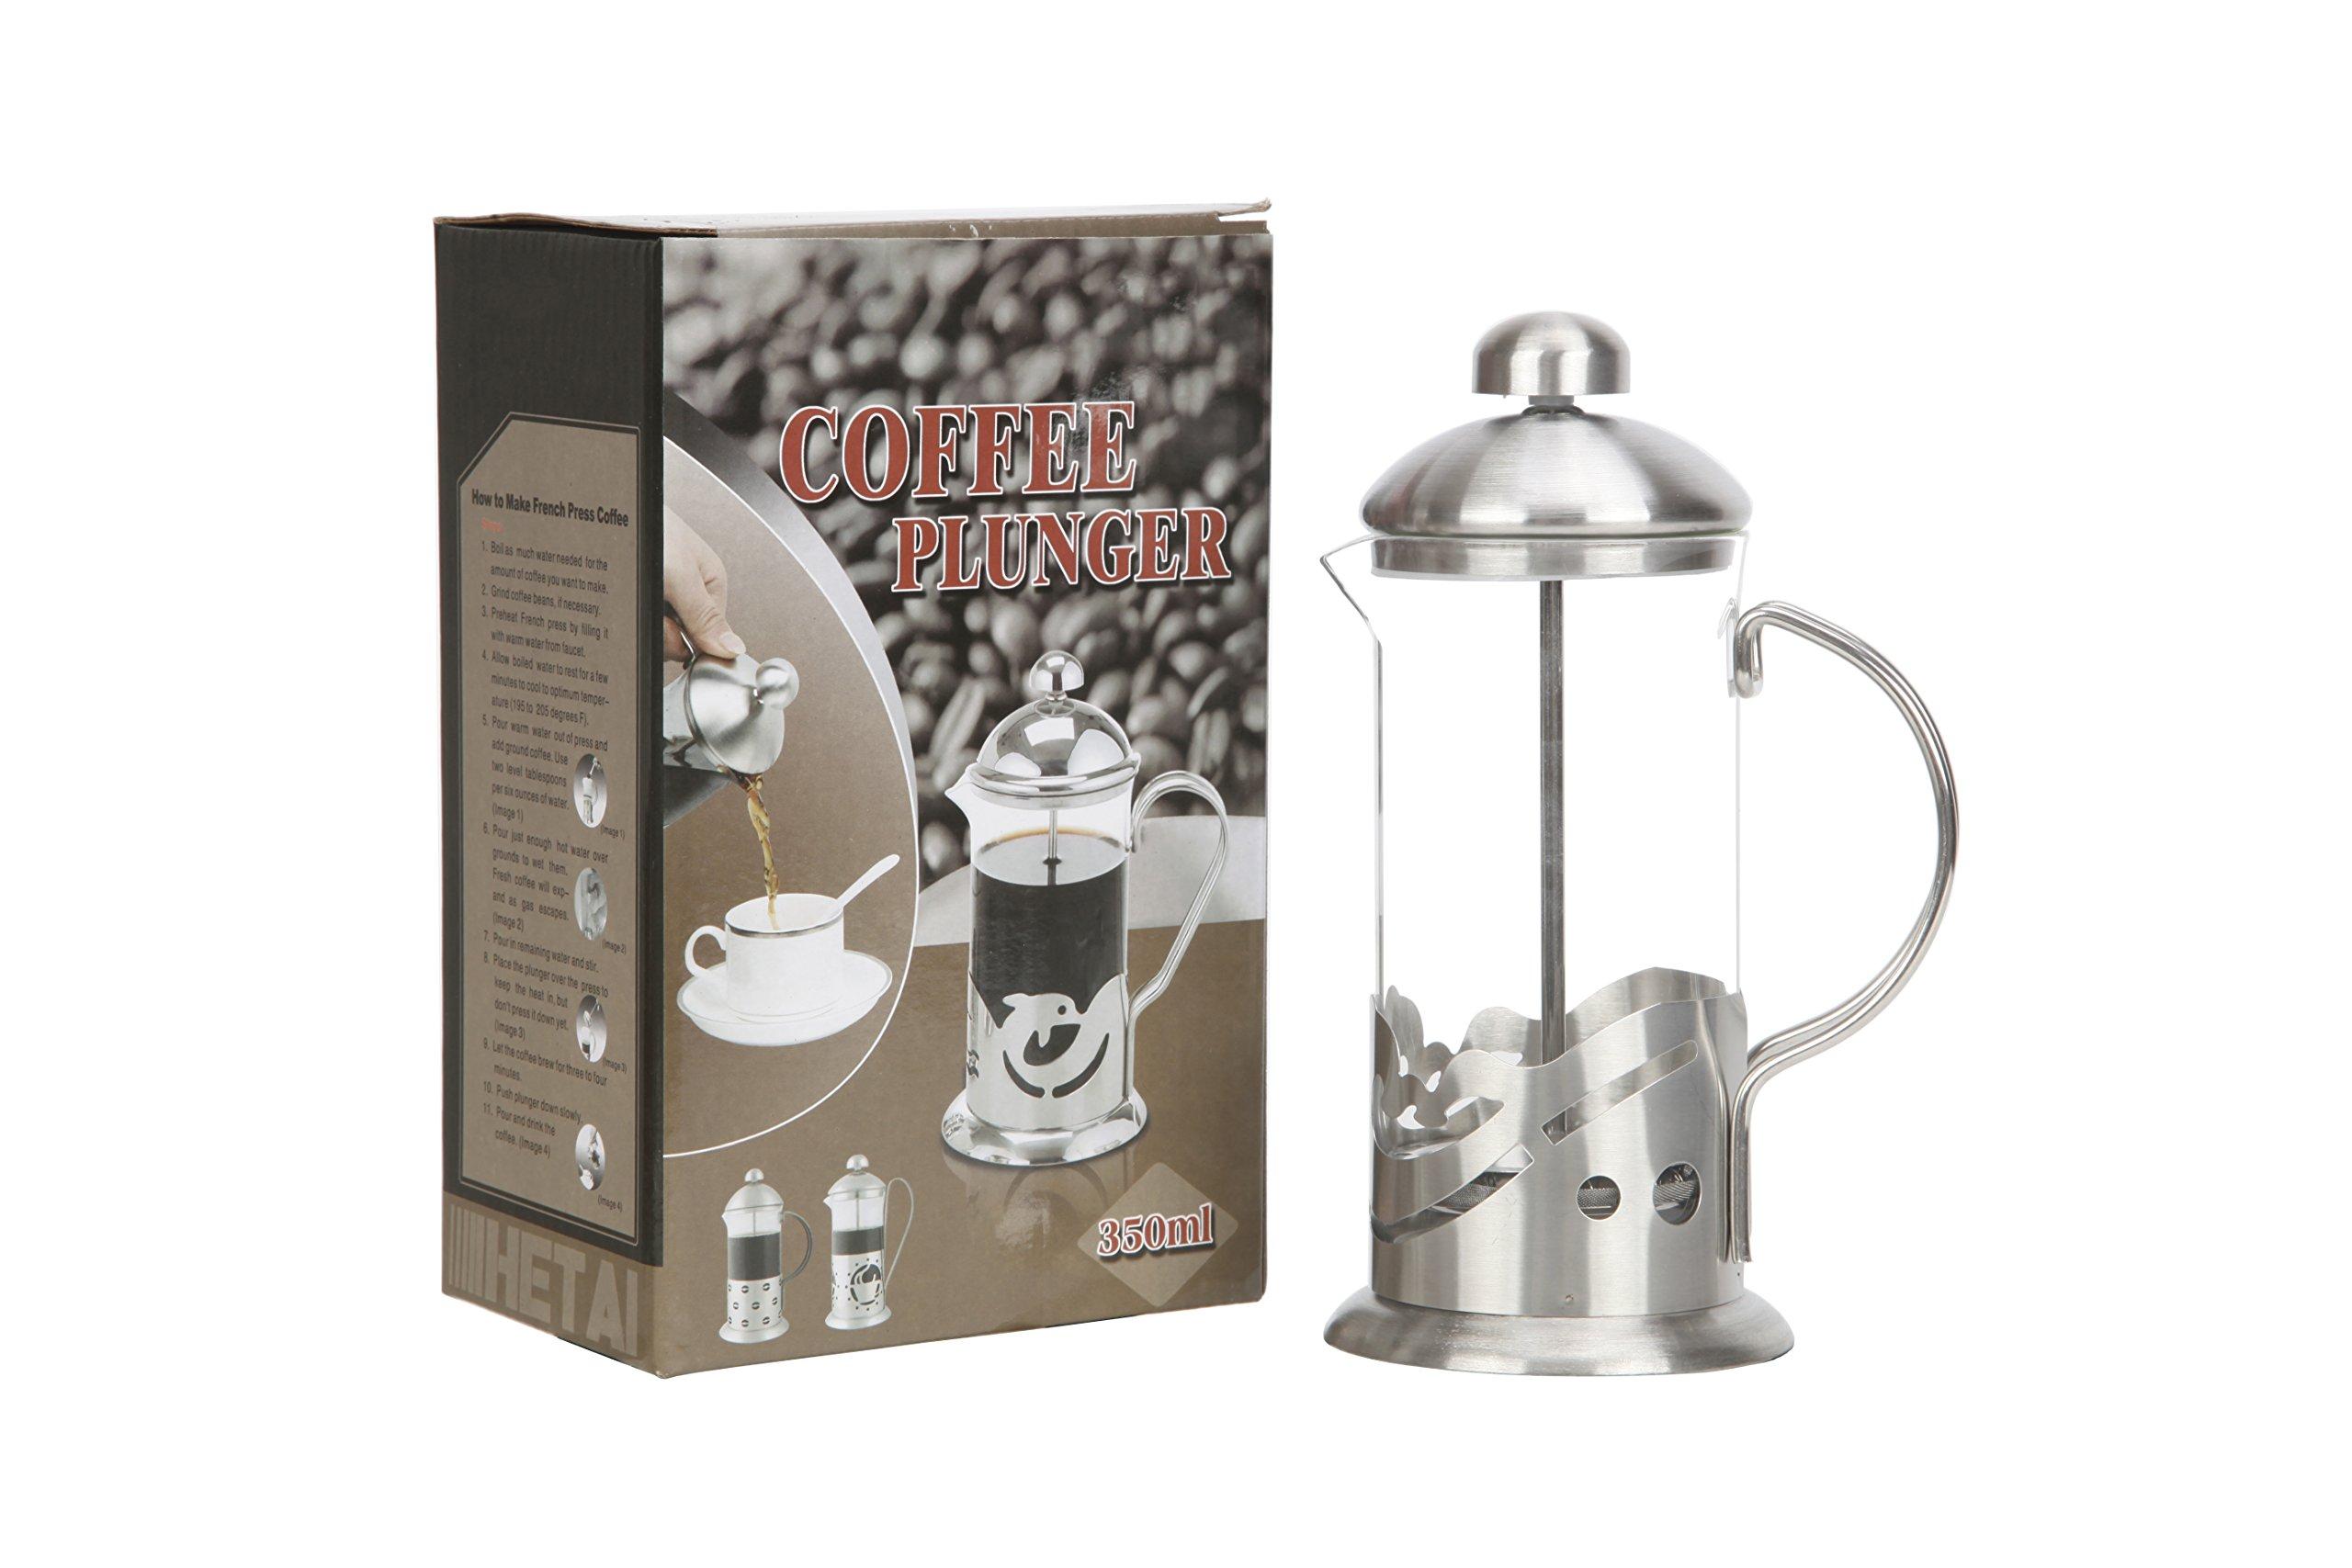 French Press Coffee Tea Maker Glass Stainless Steel Mini French Press Best Camping Coffee Press Pot Heat-Resistant Coffee Press 12 oz(350ML)